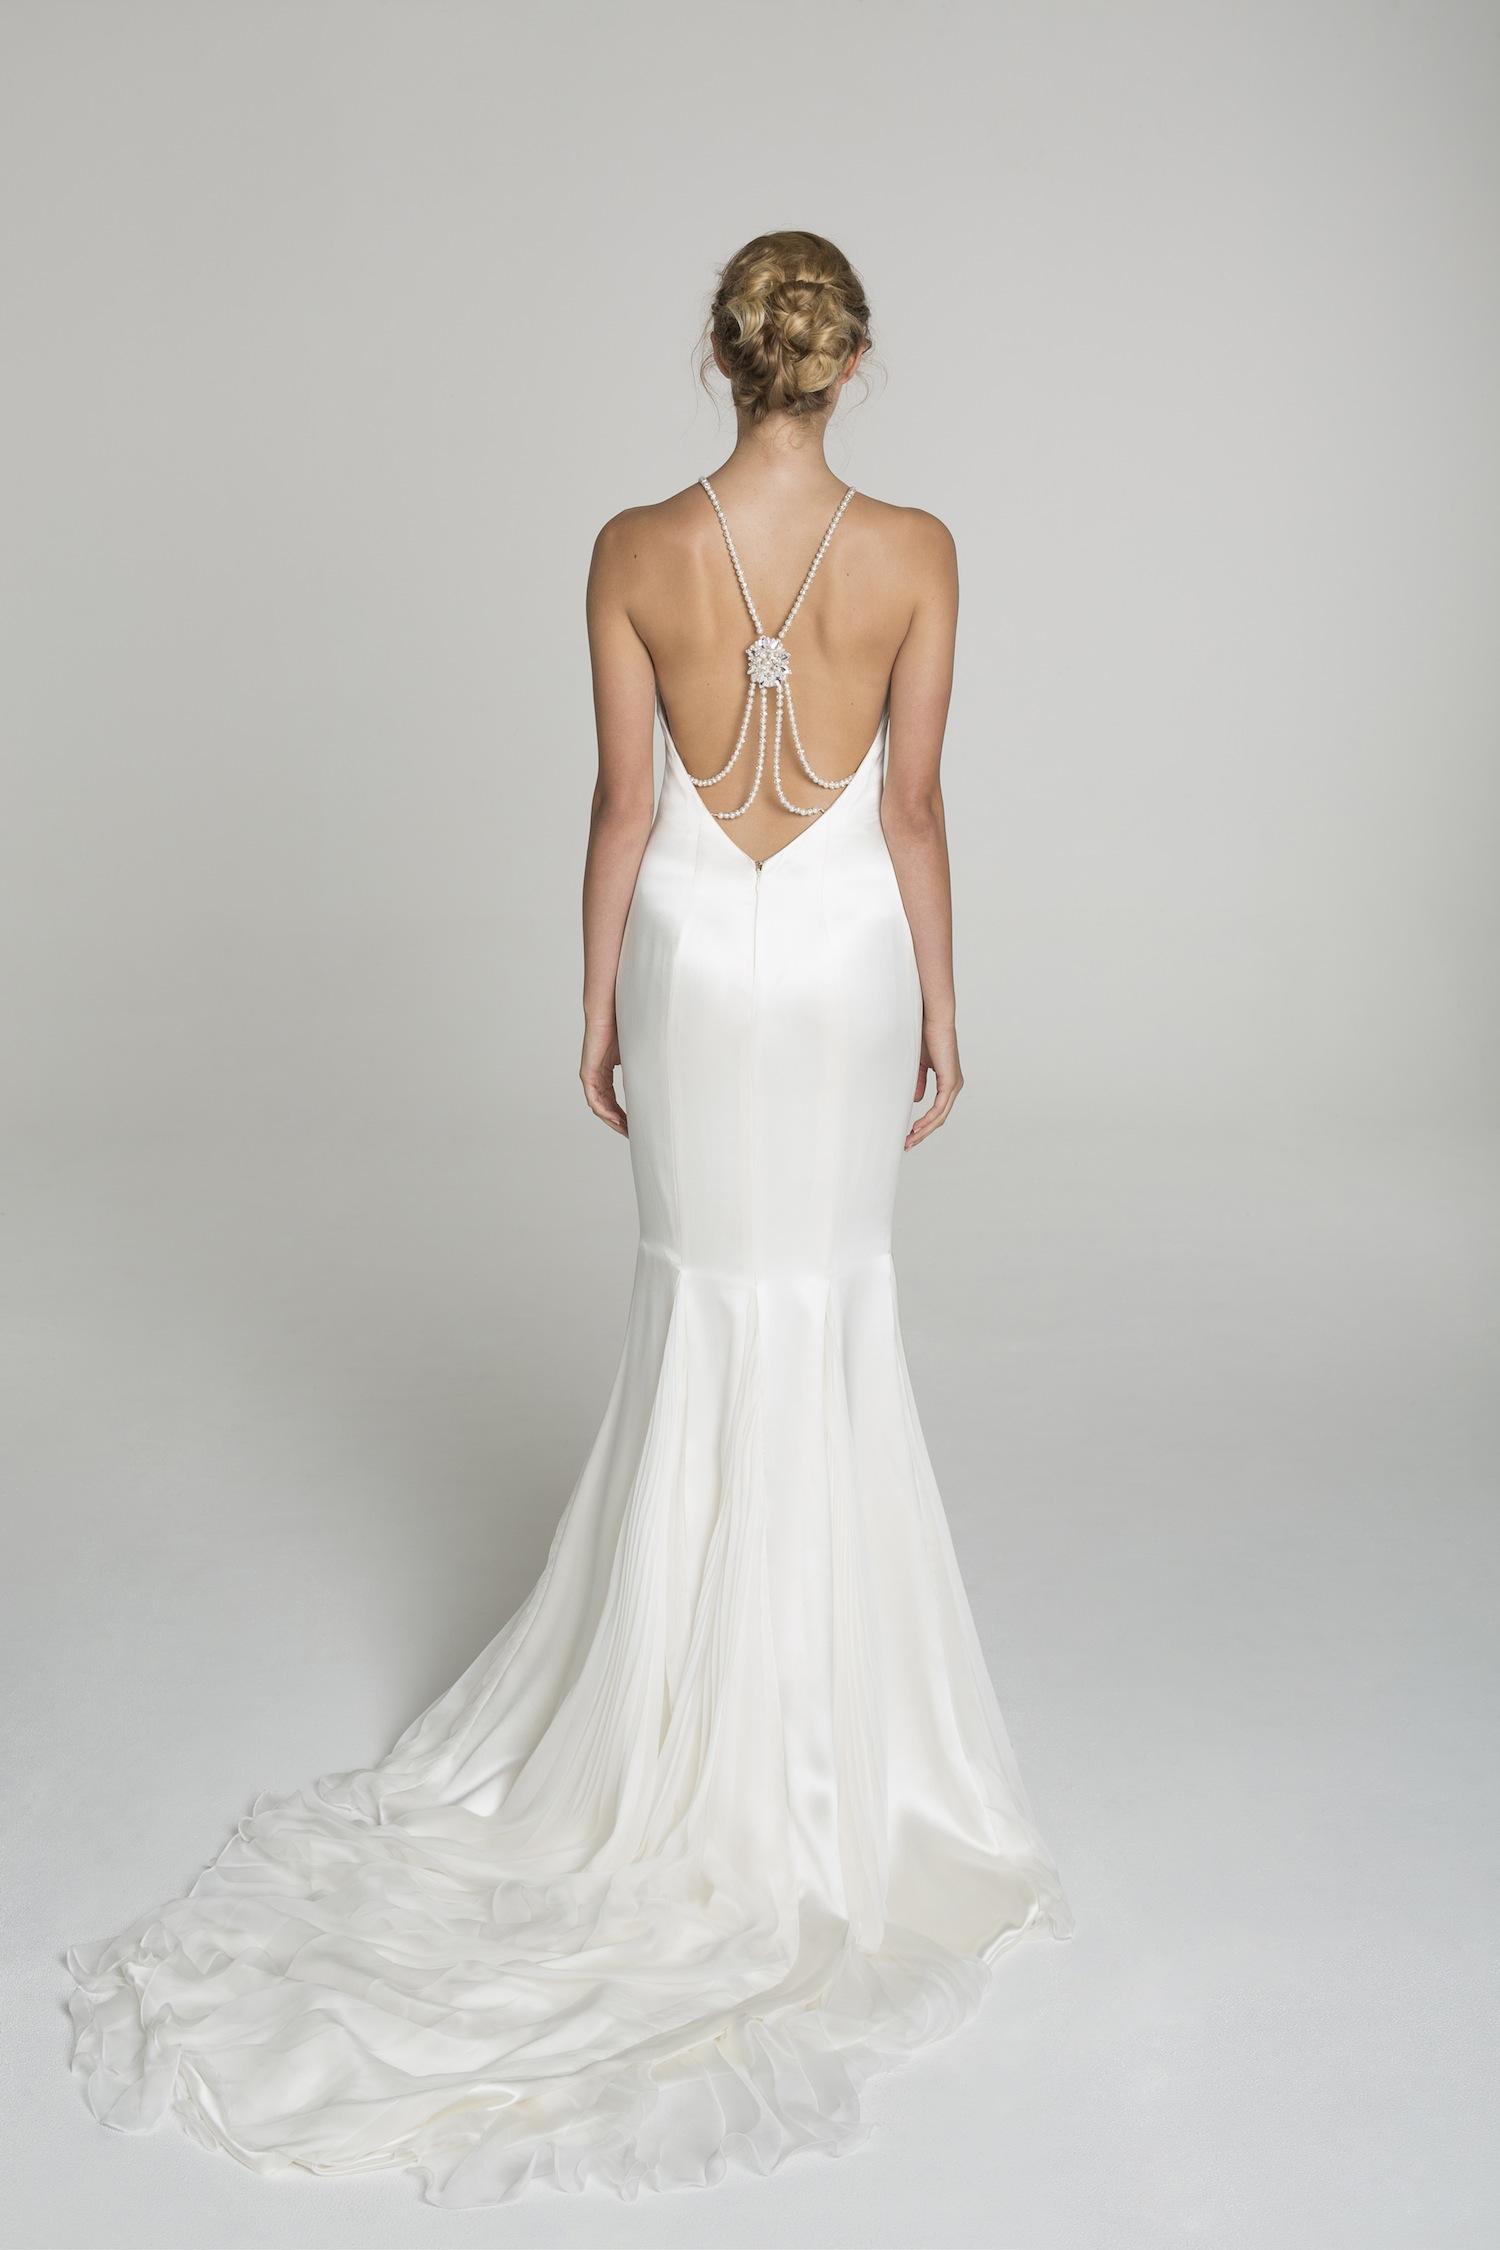 High neck wedding dress from alana aoun for Wedding dress high neck